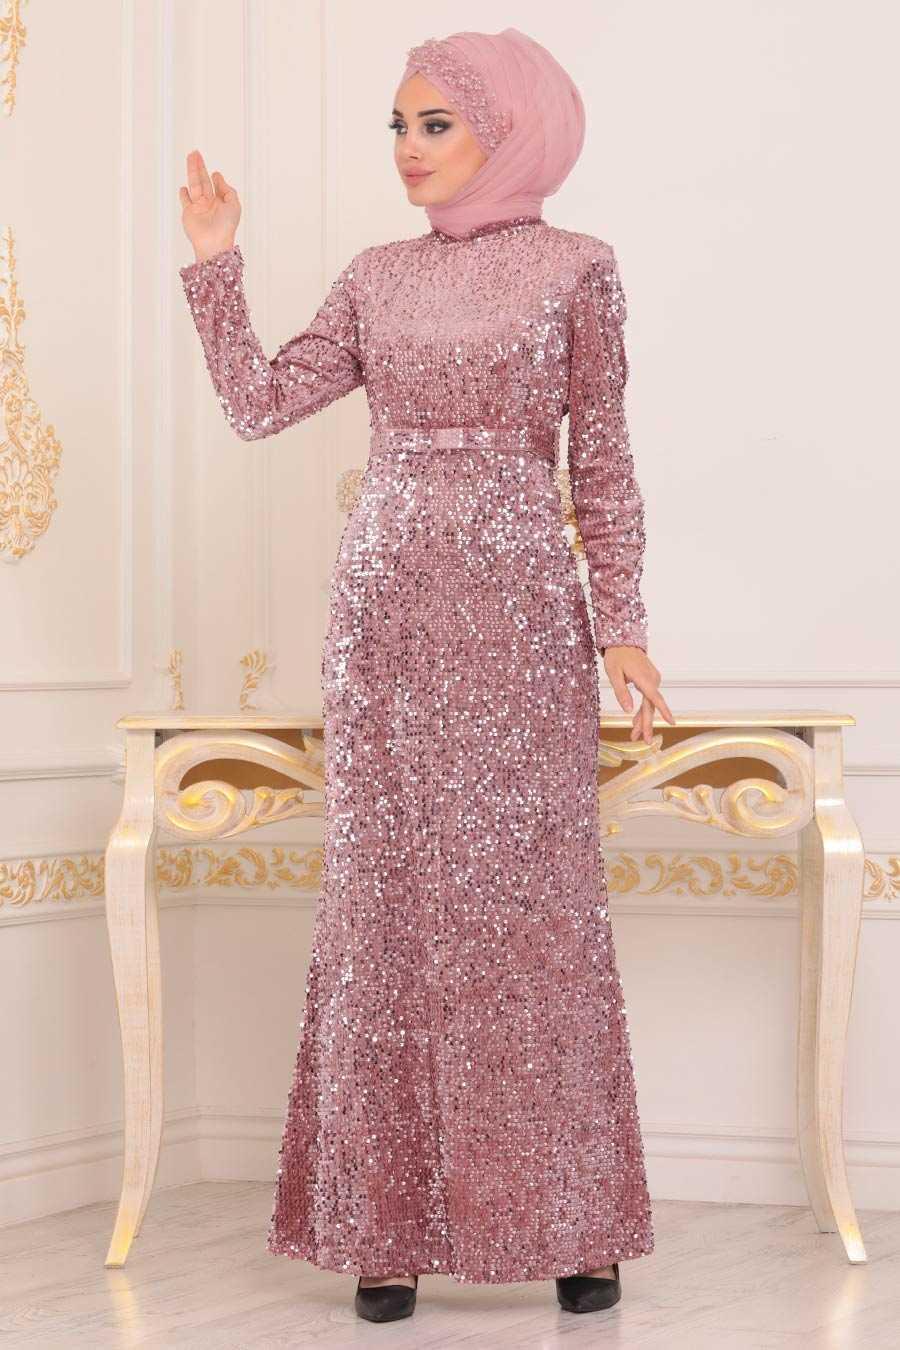 Pul Payetli Pudra Tesettür Abiye Elbise 8727PD